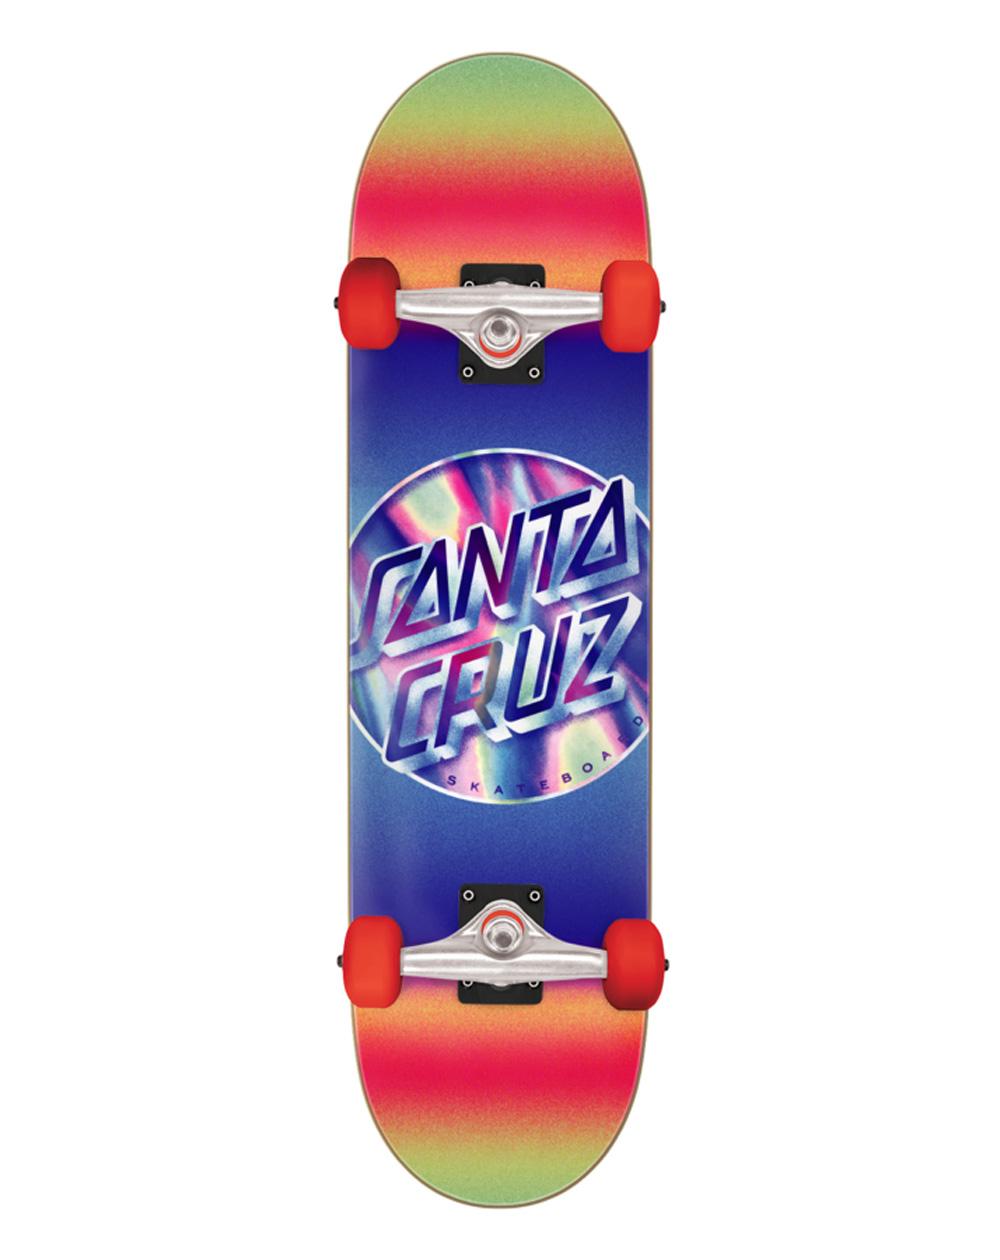 "Santa Cruz Iridescent Dot Large 8.25"" Complete Skateboard"